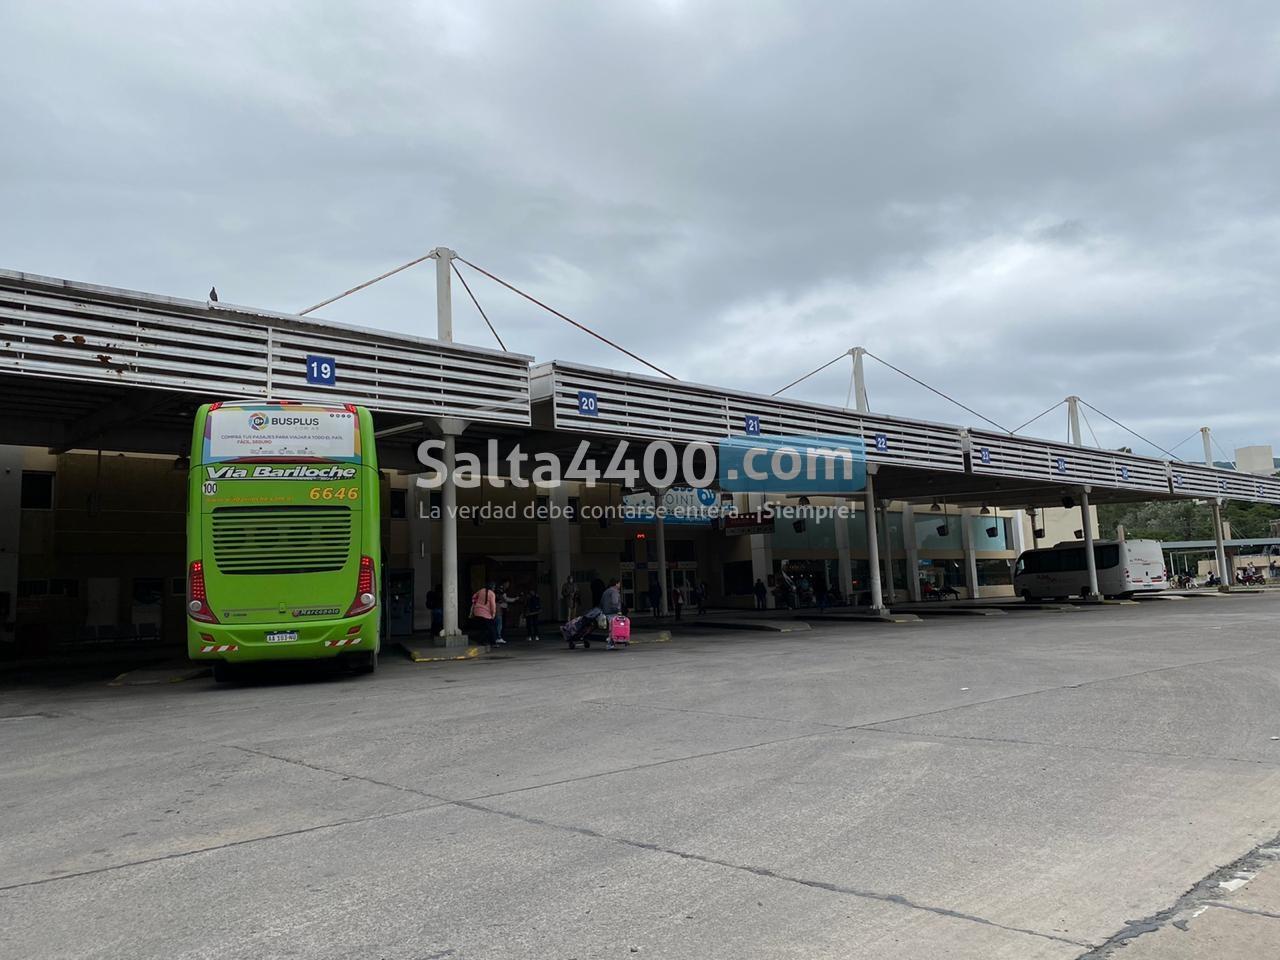 terminal de ómnibus de Salta